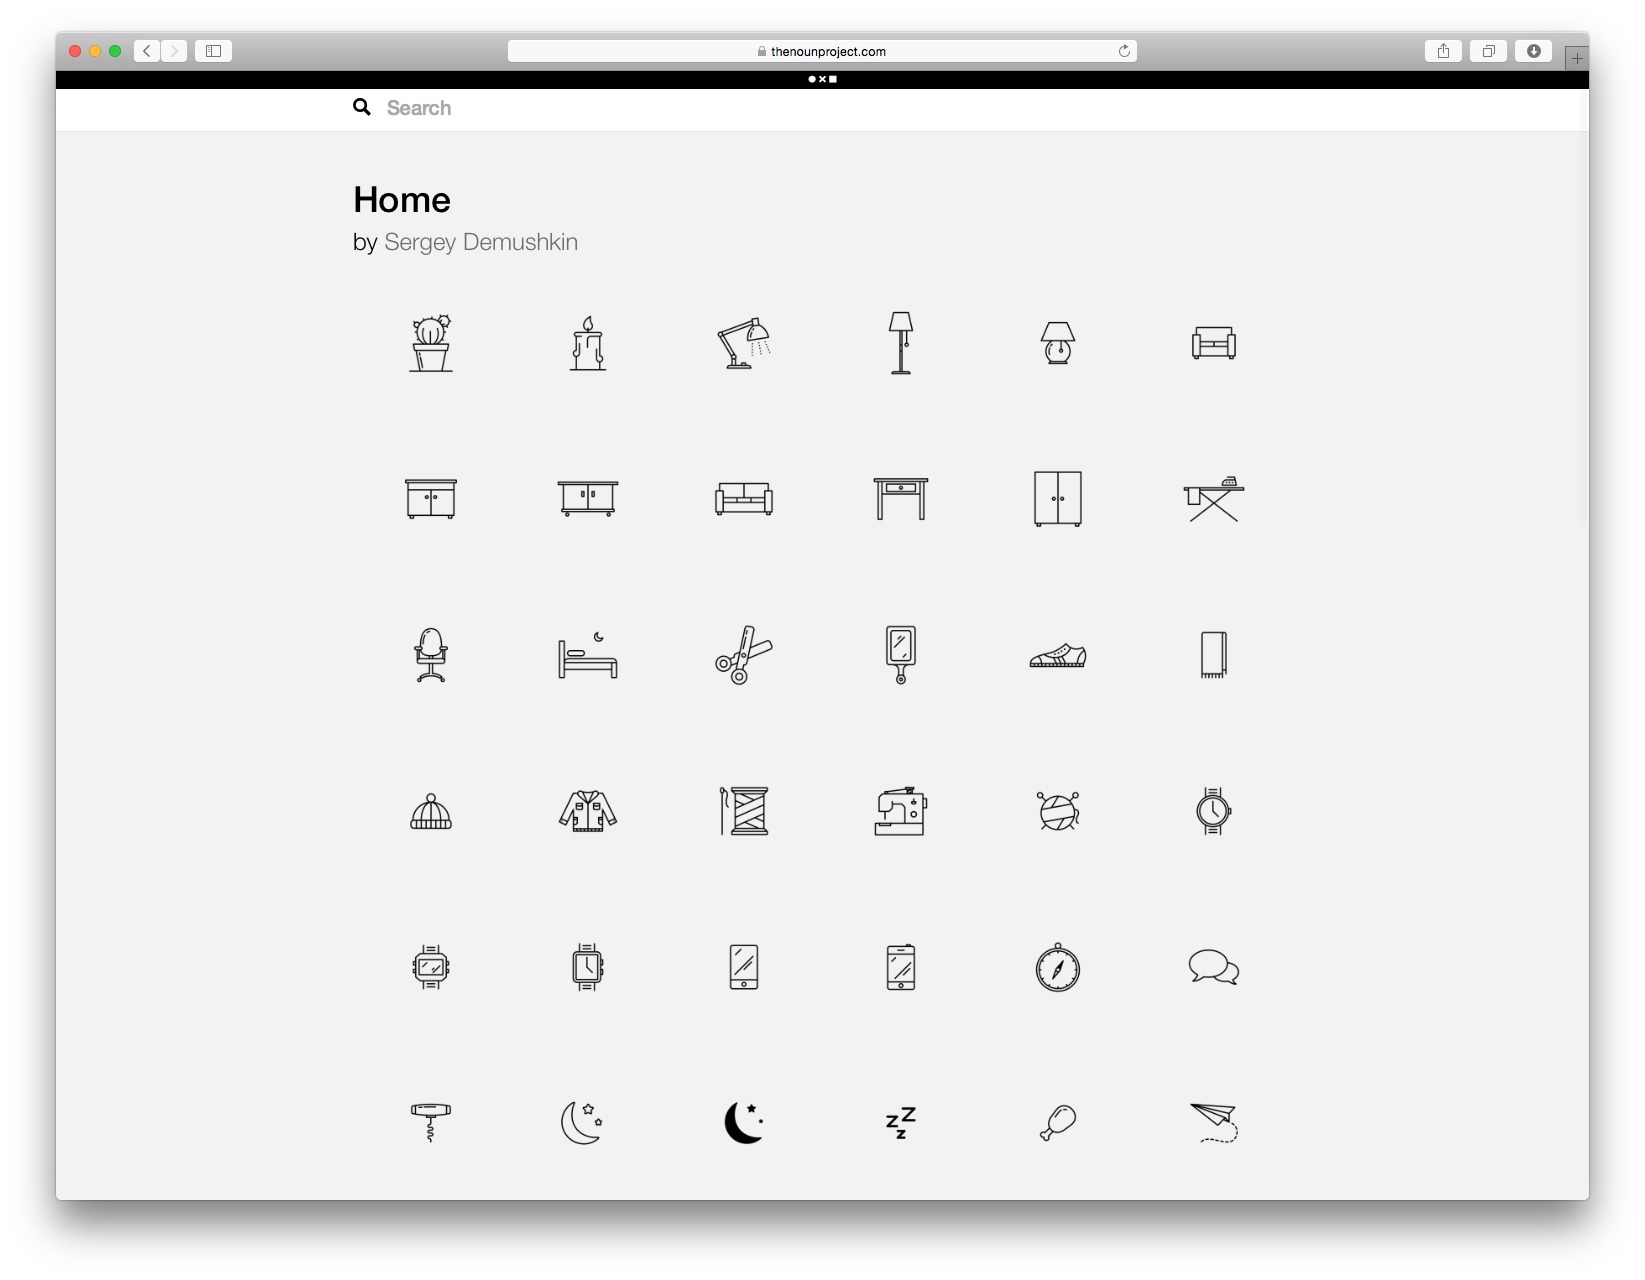 The Noun Project: iconos para tus esquemas y diagramas de representación arquitectónica